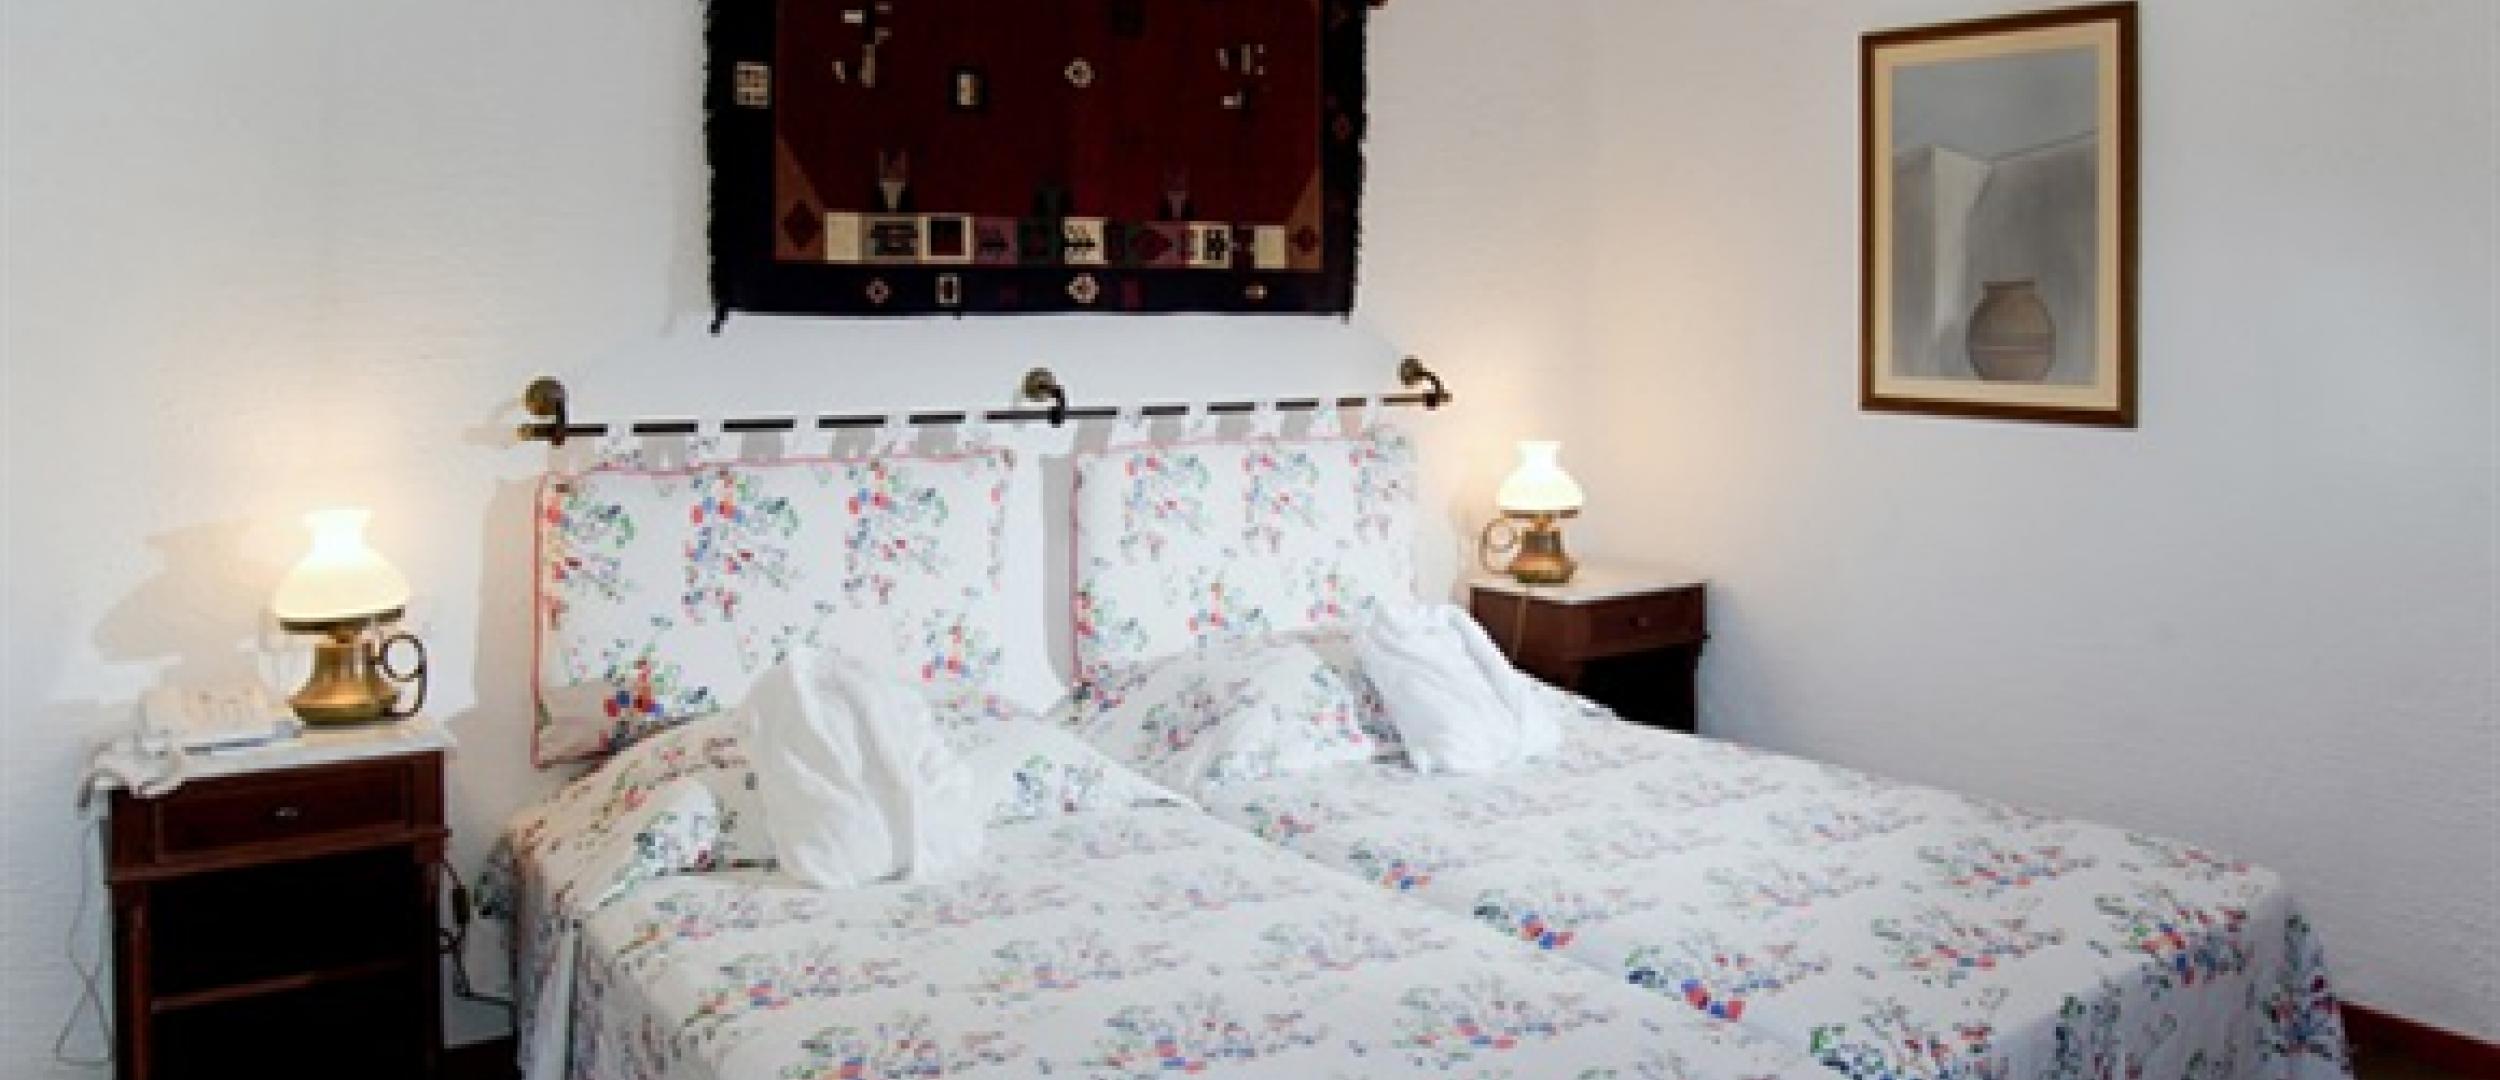 Cazare Creta Maris Beach Resort 5 Heraklion Preţuri Camere